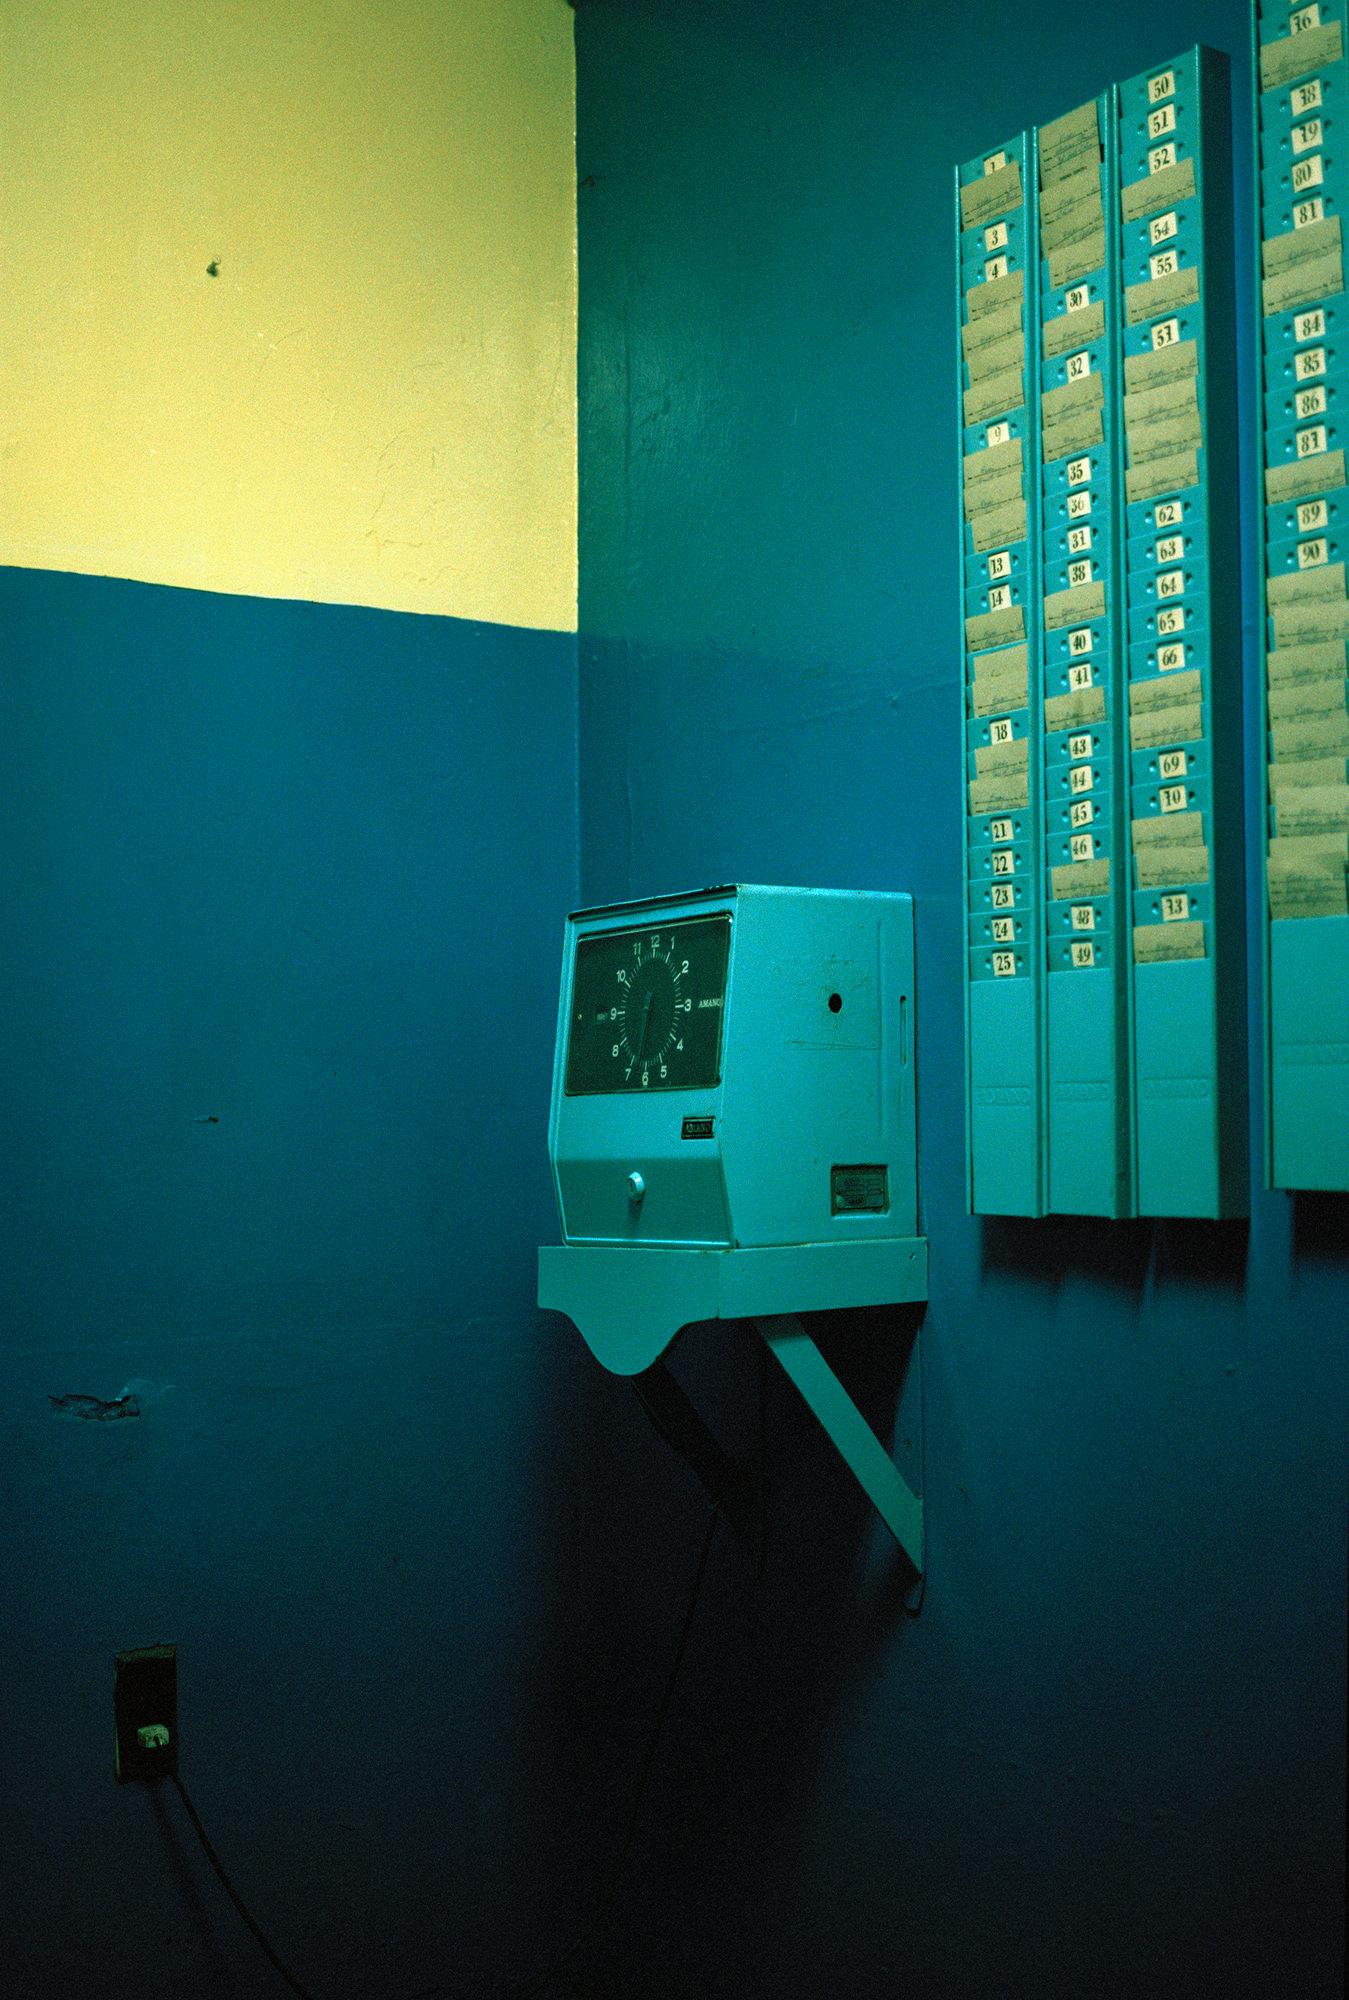 23 95_TimeClock-WS-025.jpg